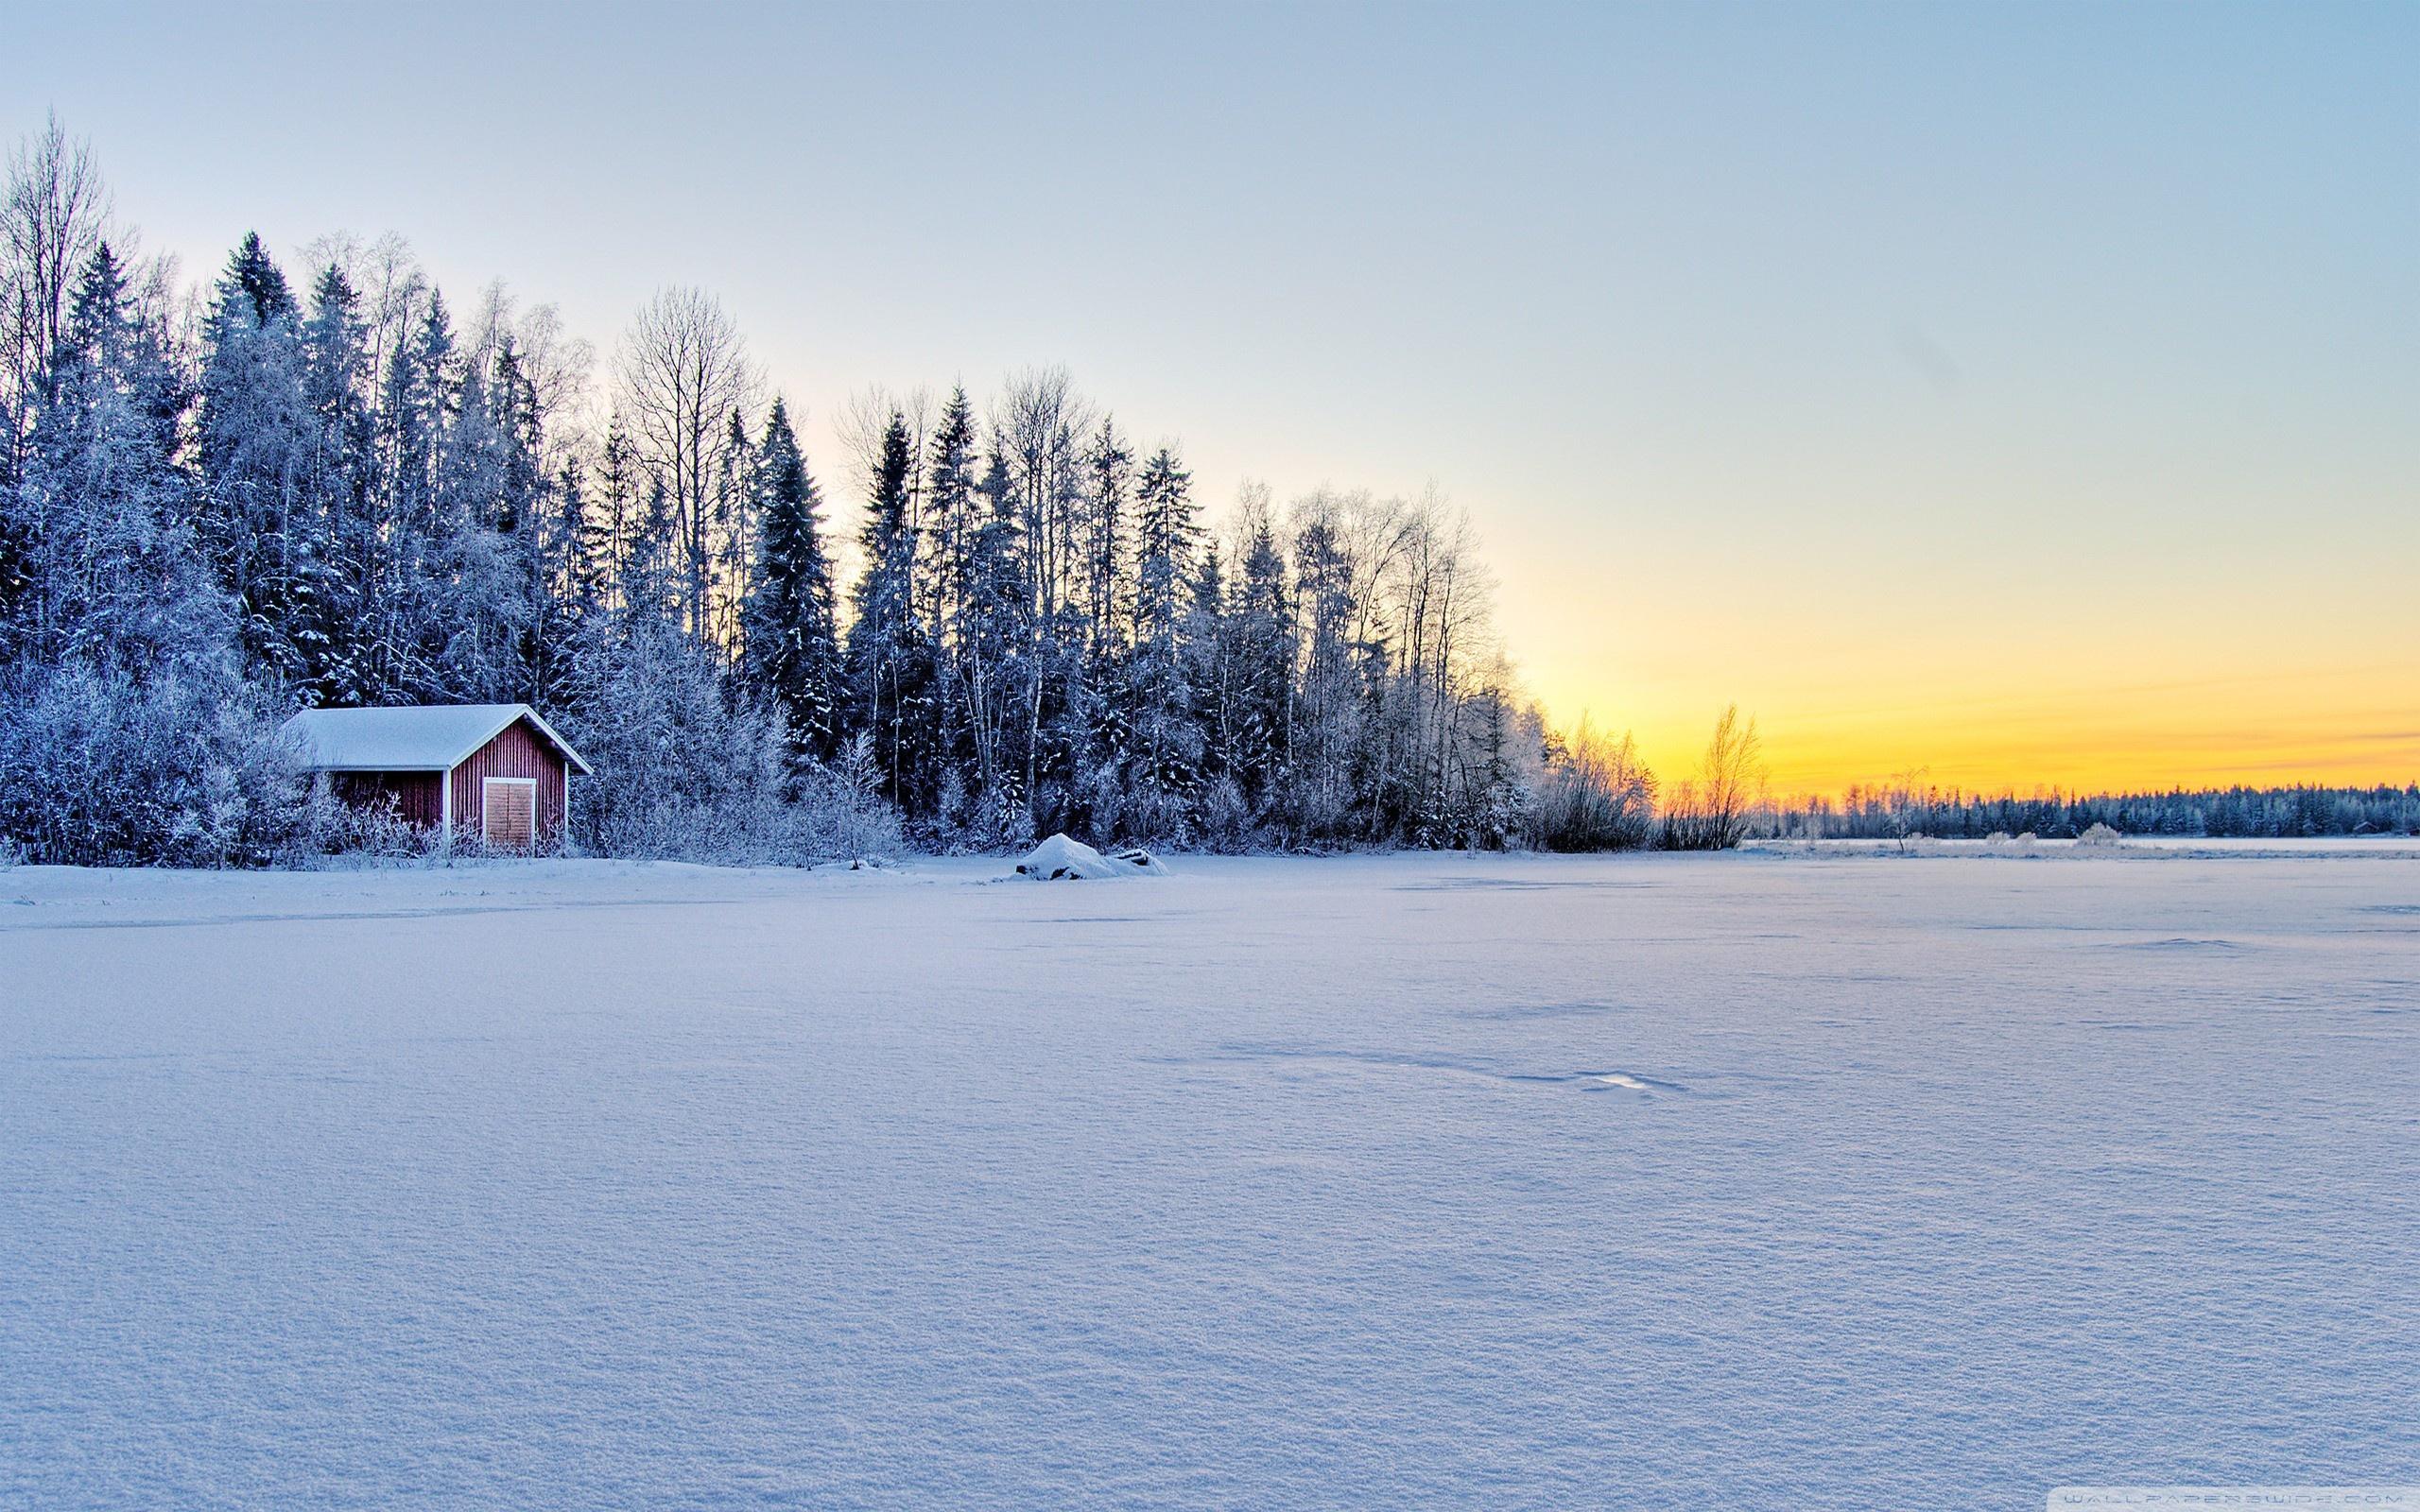 Frozen Lake Hd Desktop Wallpaper High Definition Fullscreen 2560x1600px